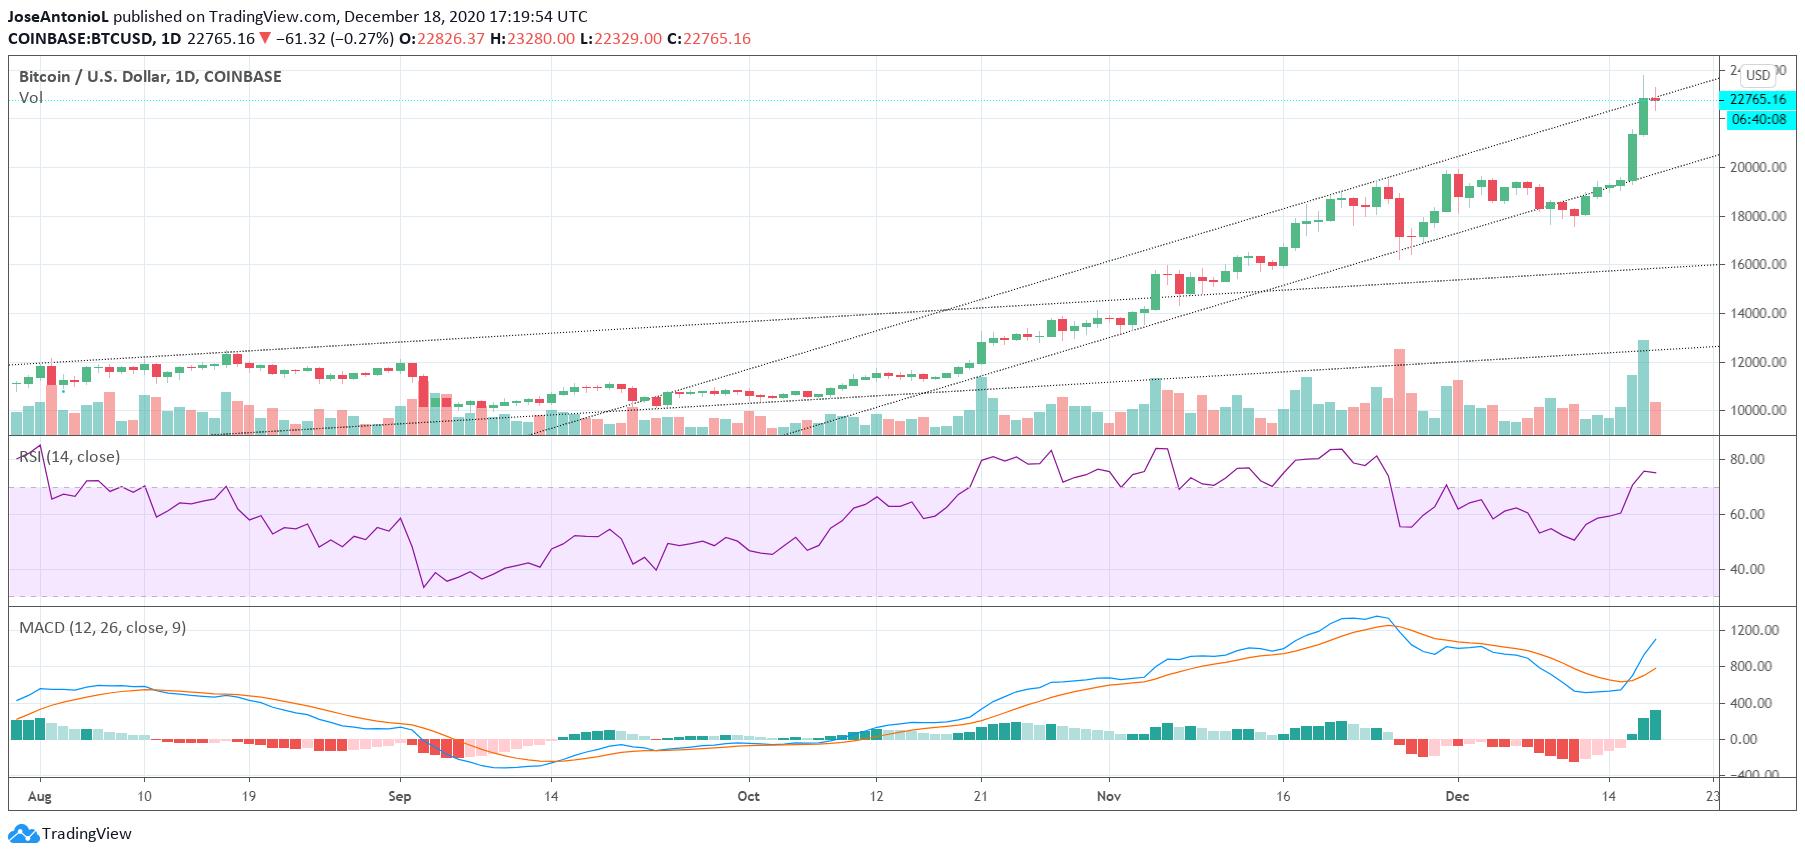 Bitcoin price. Image: TradingView